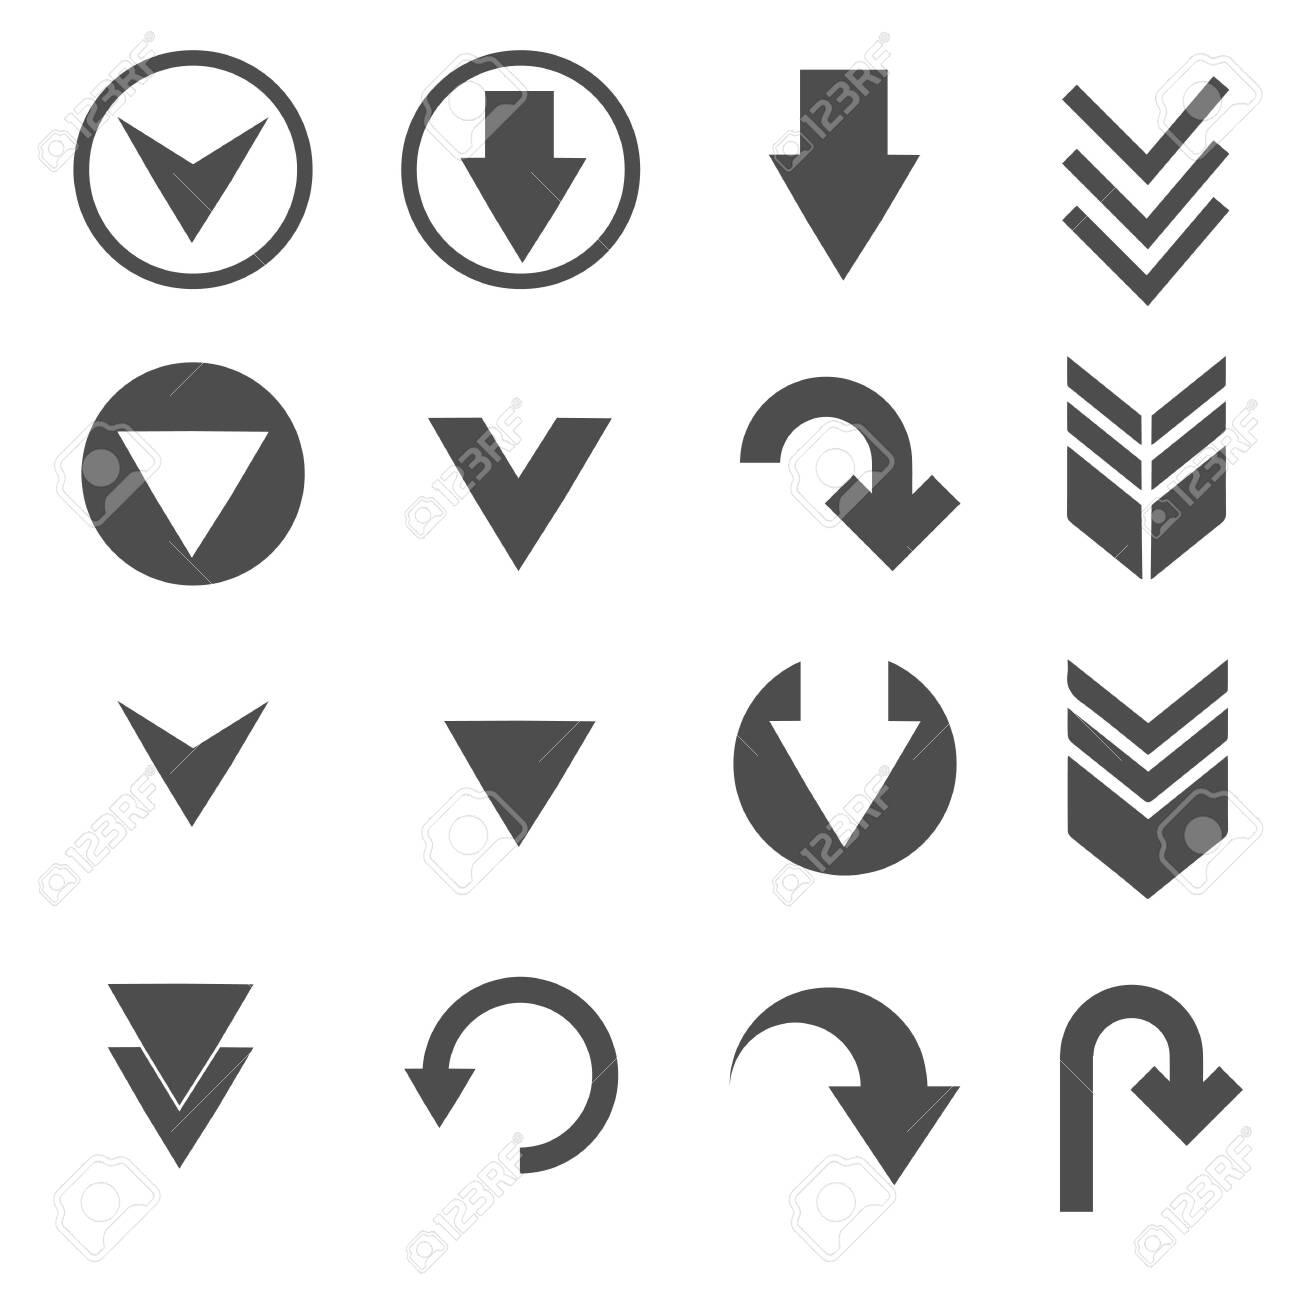 down arrow sign icons set - 146346902